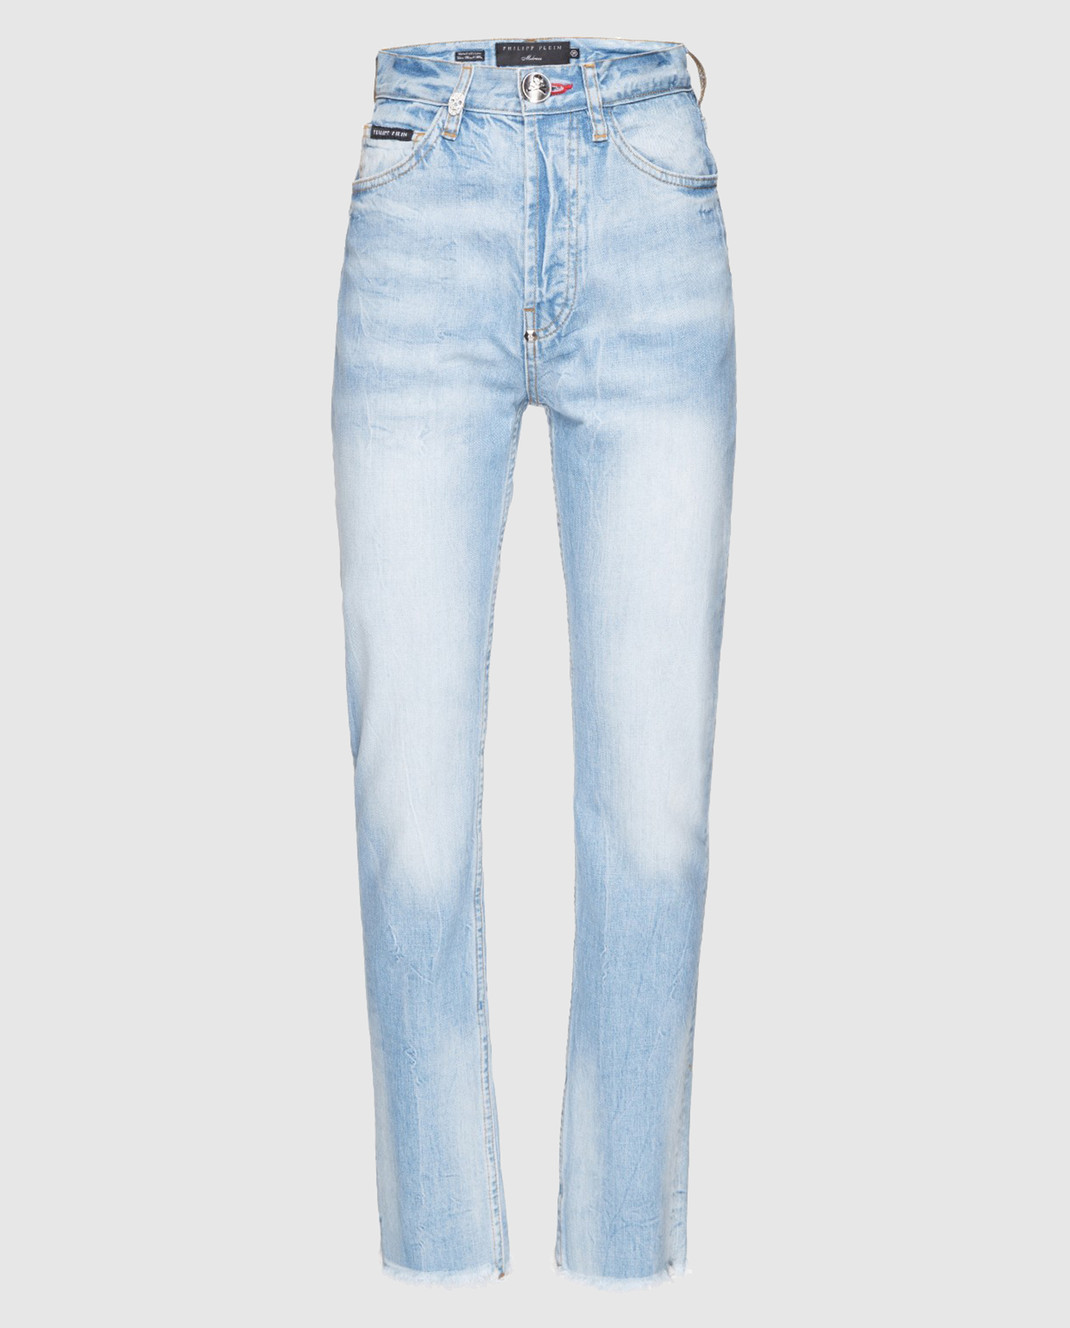 Philipp Plein Голубые джинсы изображение 1